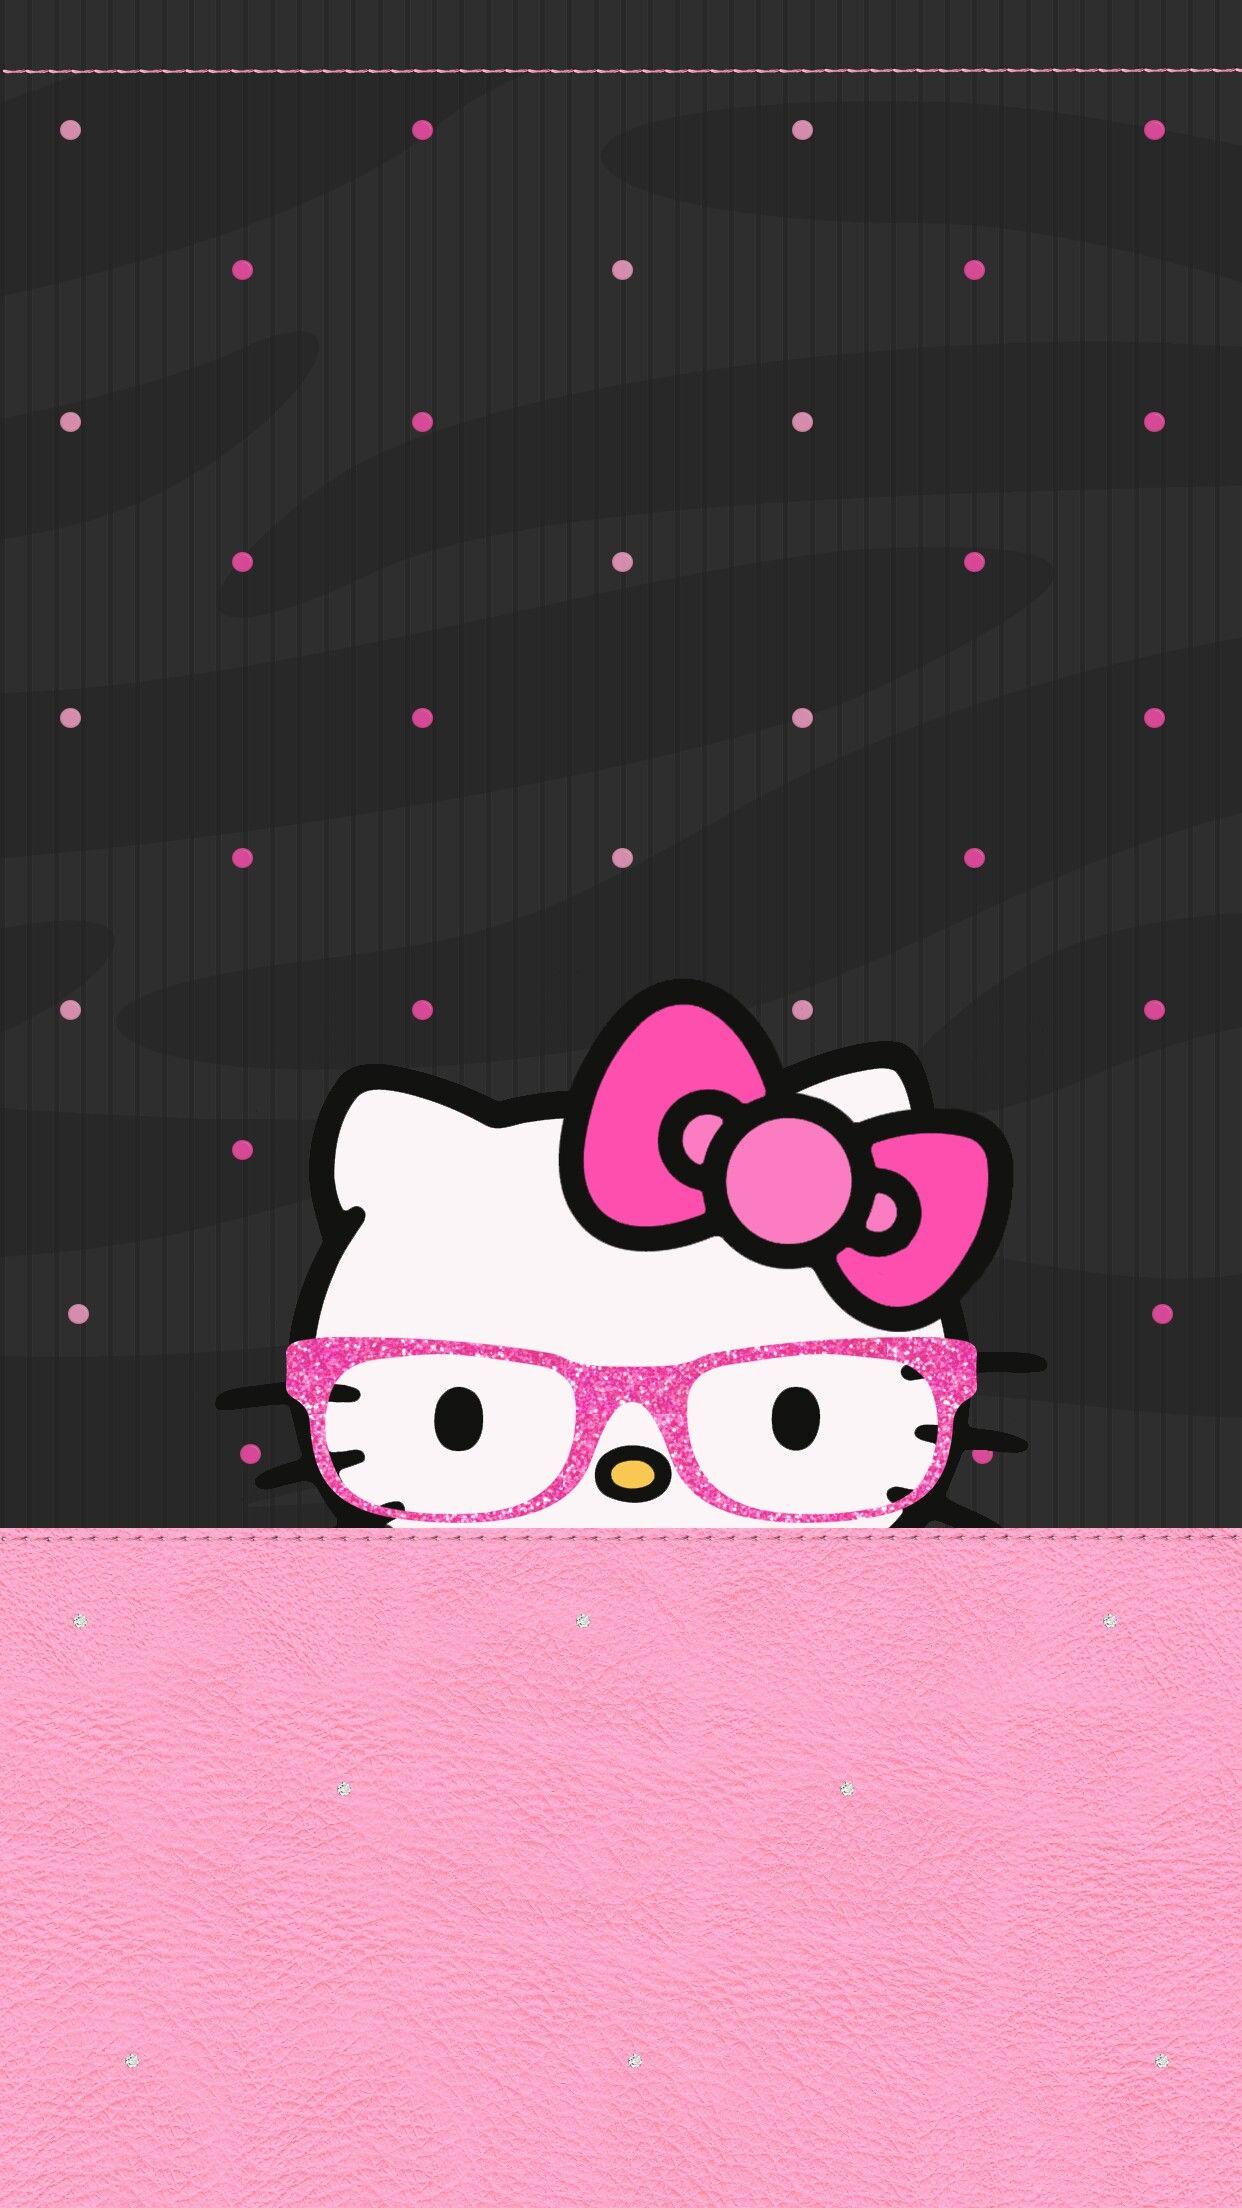 Top Wallpaper Hello Kitty Gray - b08431194645efa1d492d0dc5d69854f  Snapshot_987617.jpg